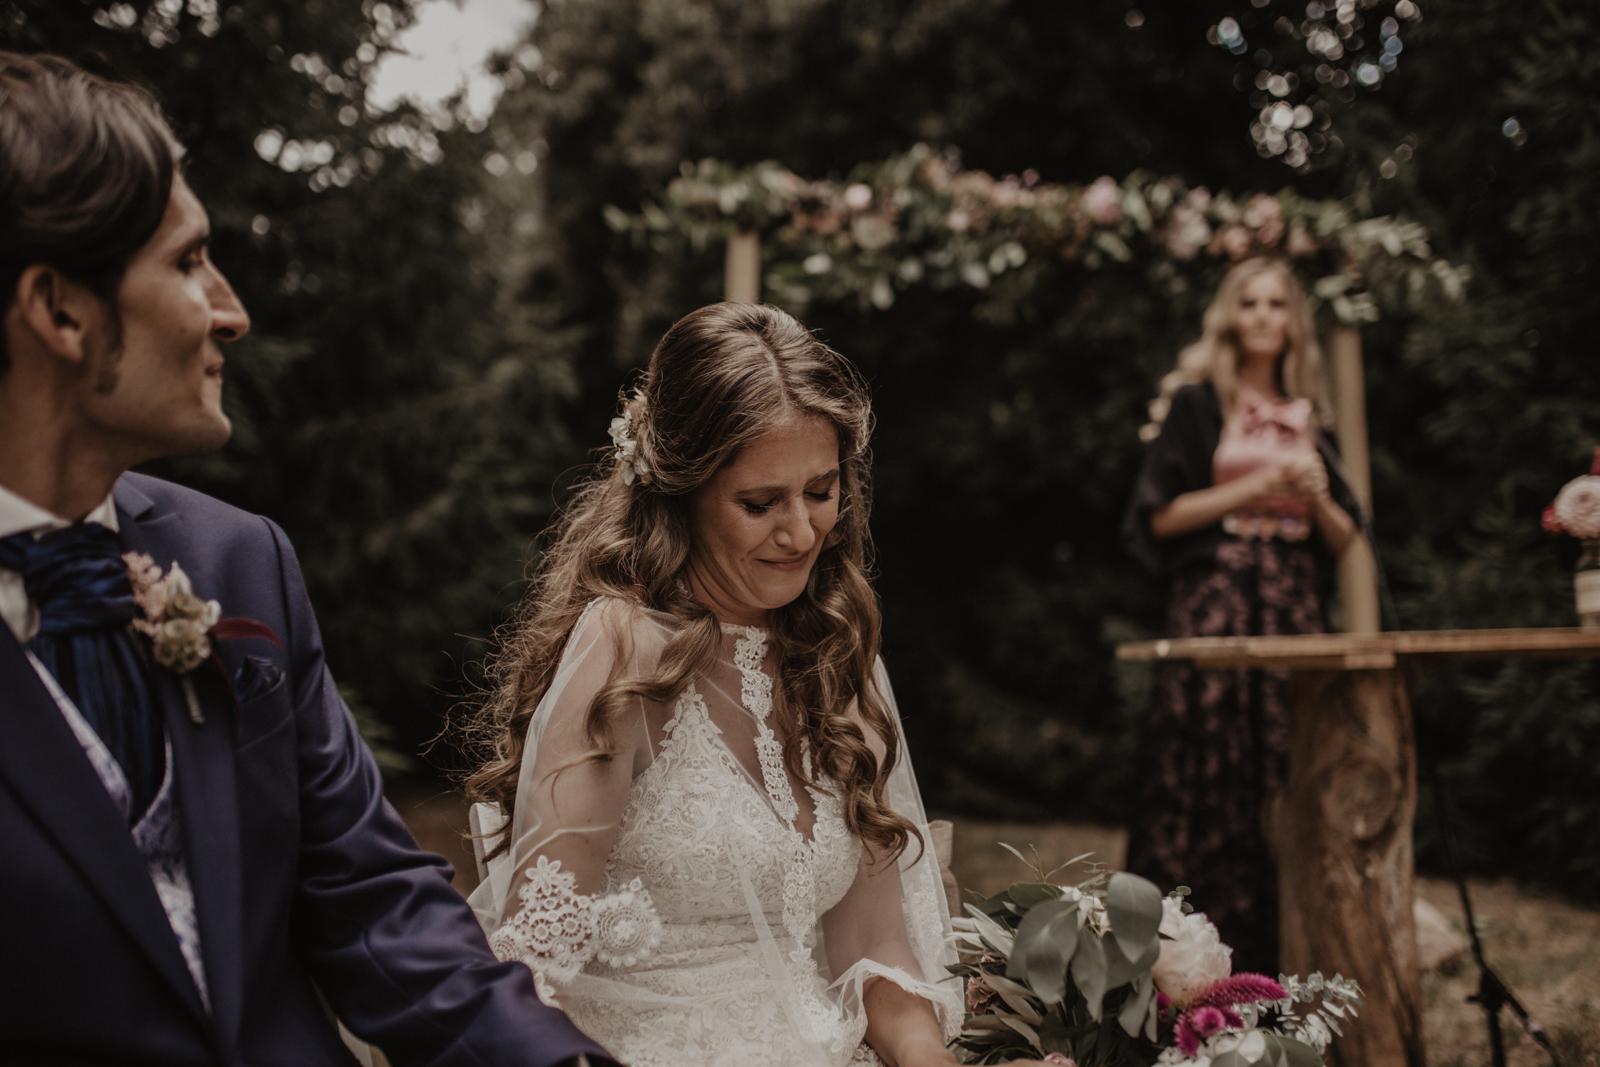 thenortherngirlphotography_photography_thenortherngirl_rebeccascabros_wedding_weddingphotography_weddingphotographer_barcelona_bodaenbarcelona_bodaenmaselmarti_bodarogeryvane-375.jpg